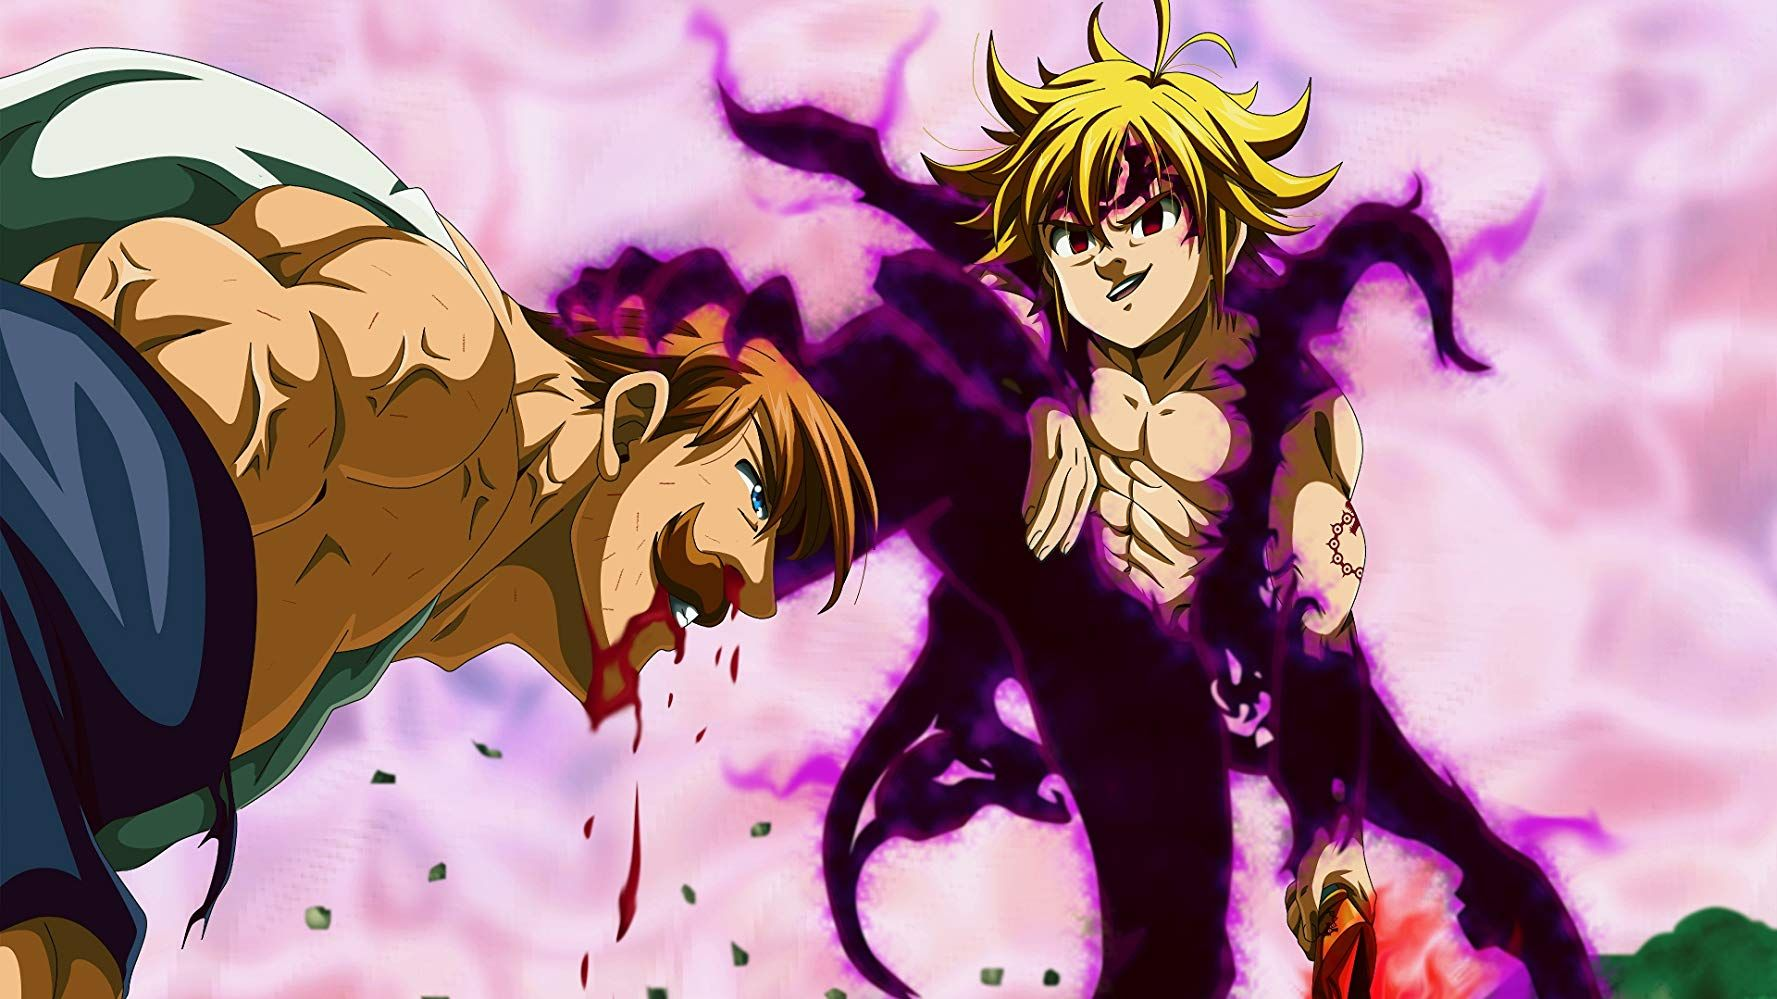 Nanatsu No Taizai 2014 In 2020 Anime Seven Deadly Sins Seven Deadly Sins Anime